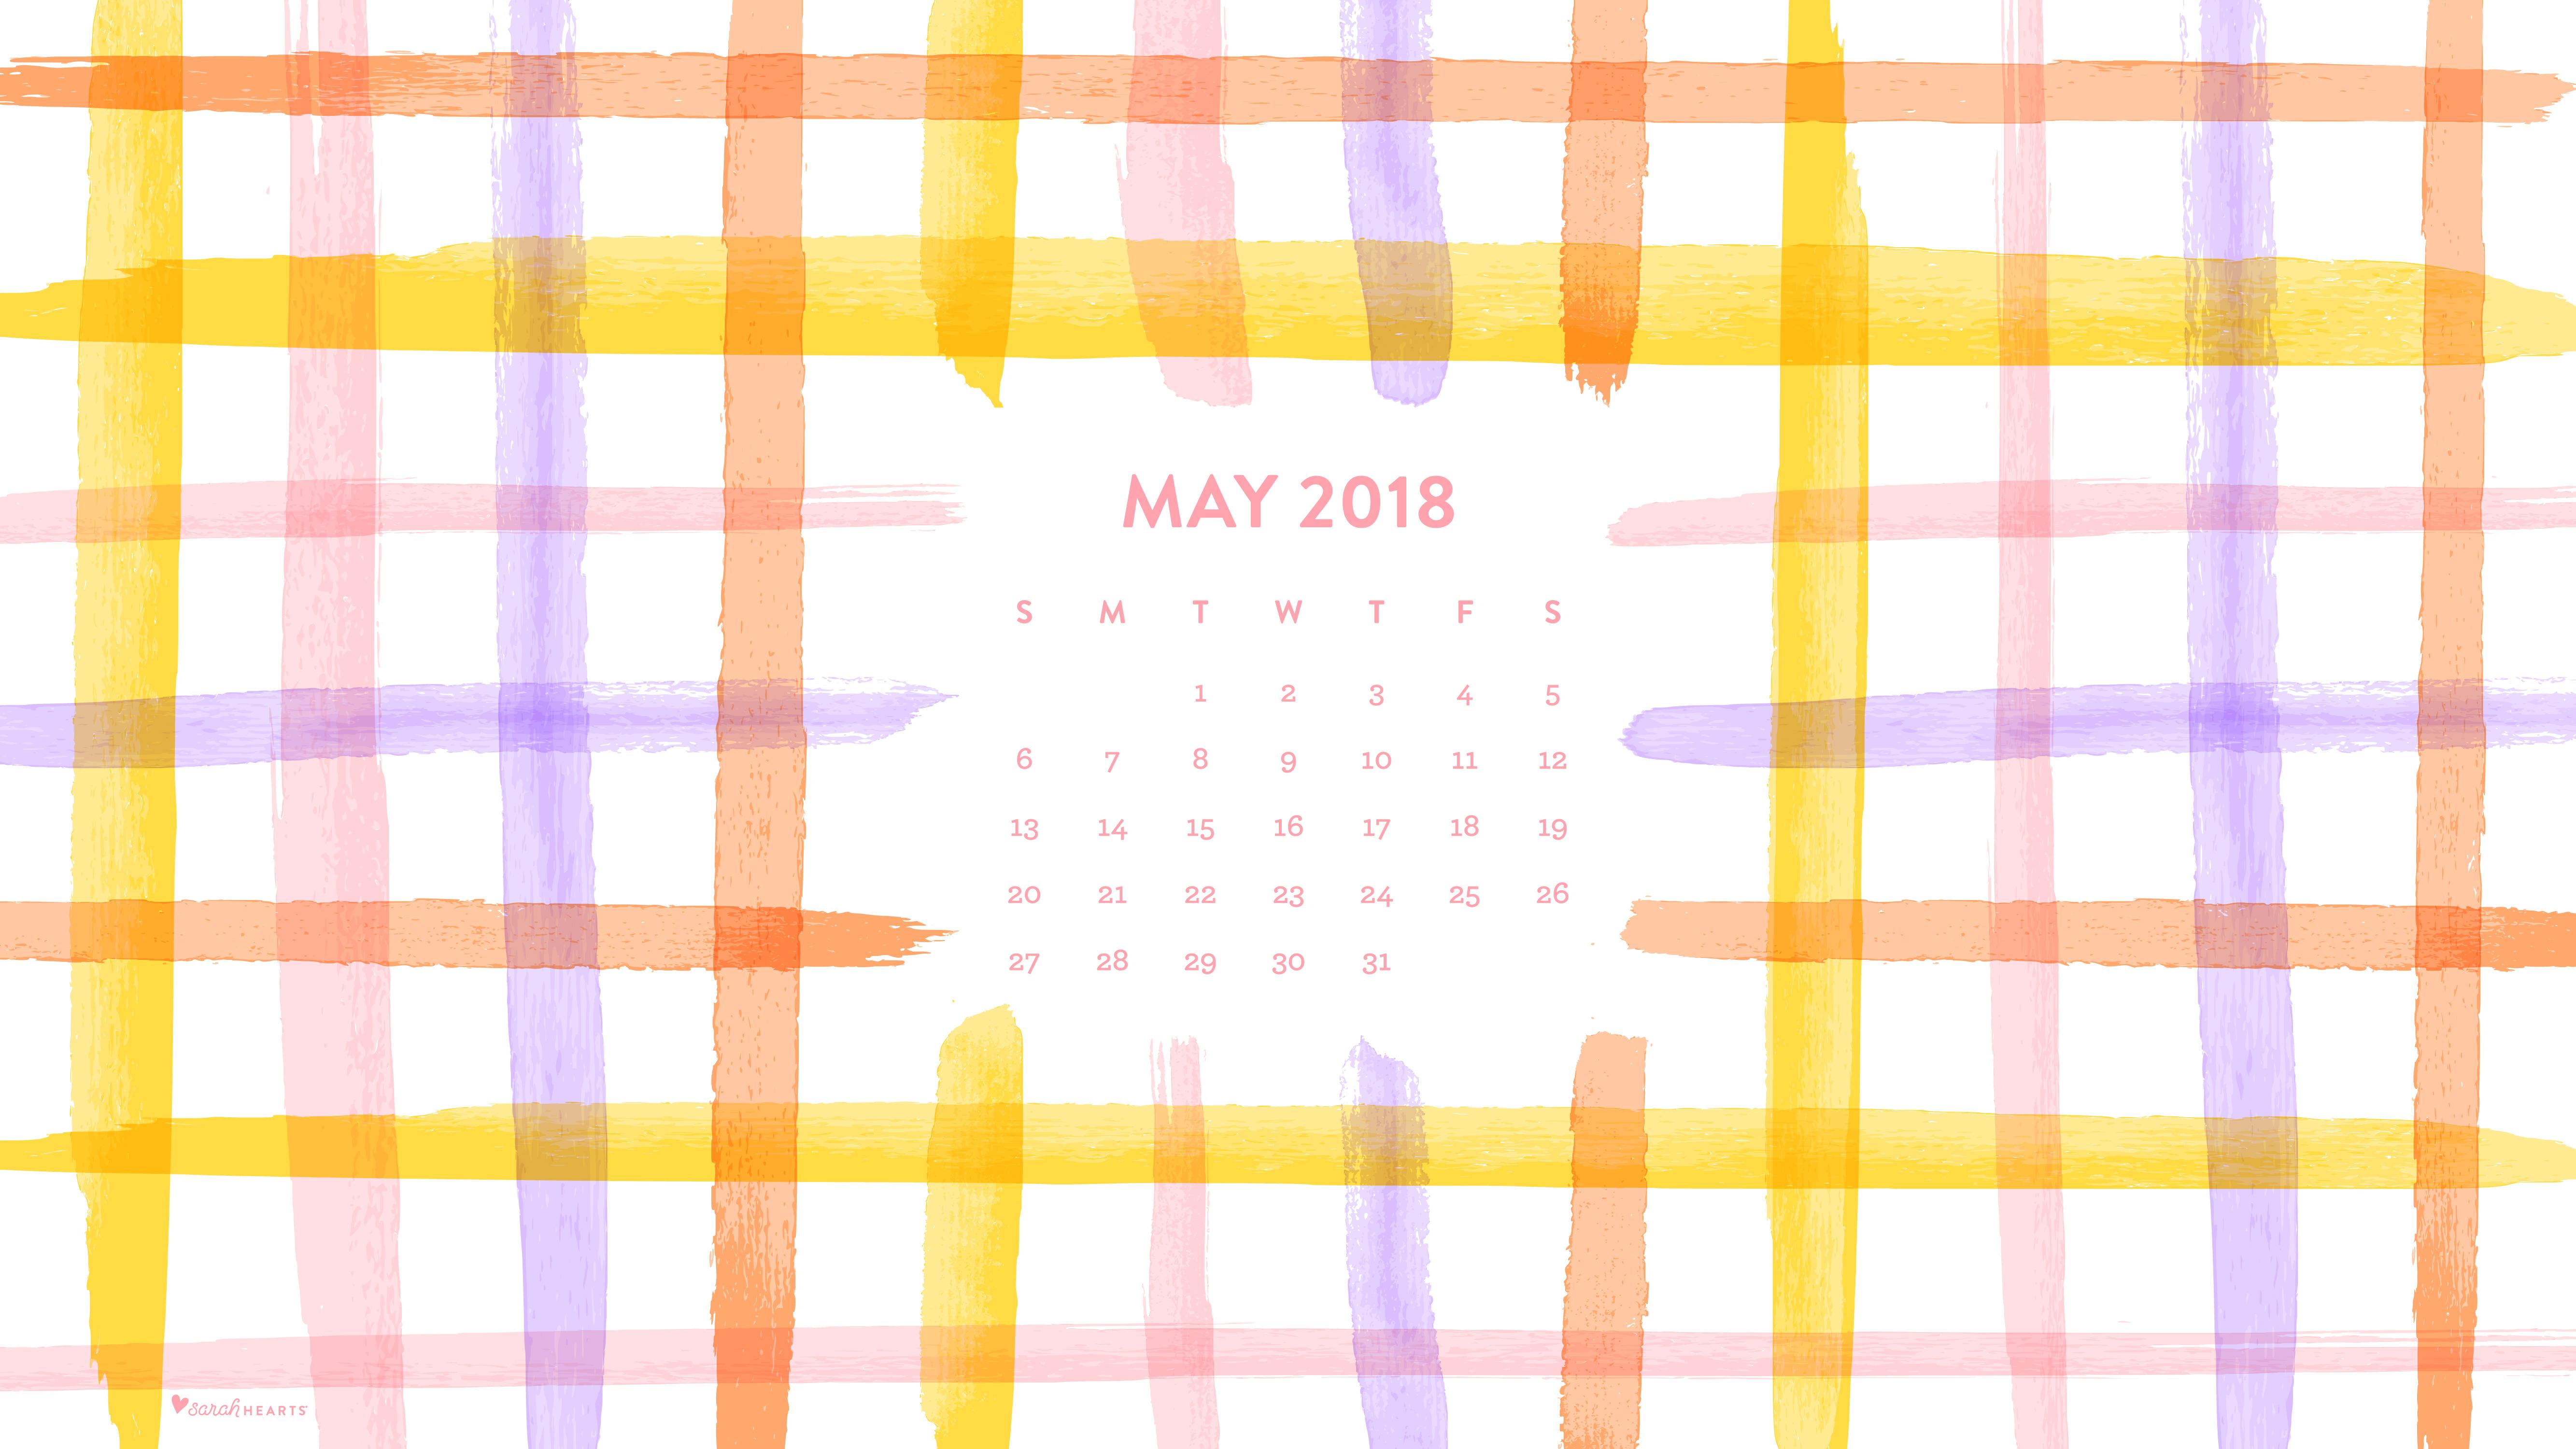 Desktop Calendar Wallpaper Creator : May 2018 spring plaid calendar wallpaper sarah hearts